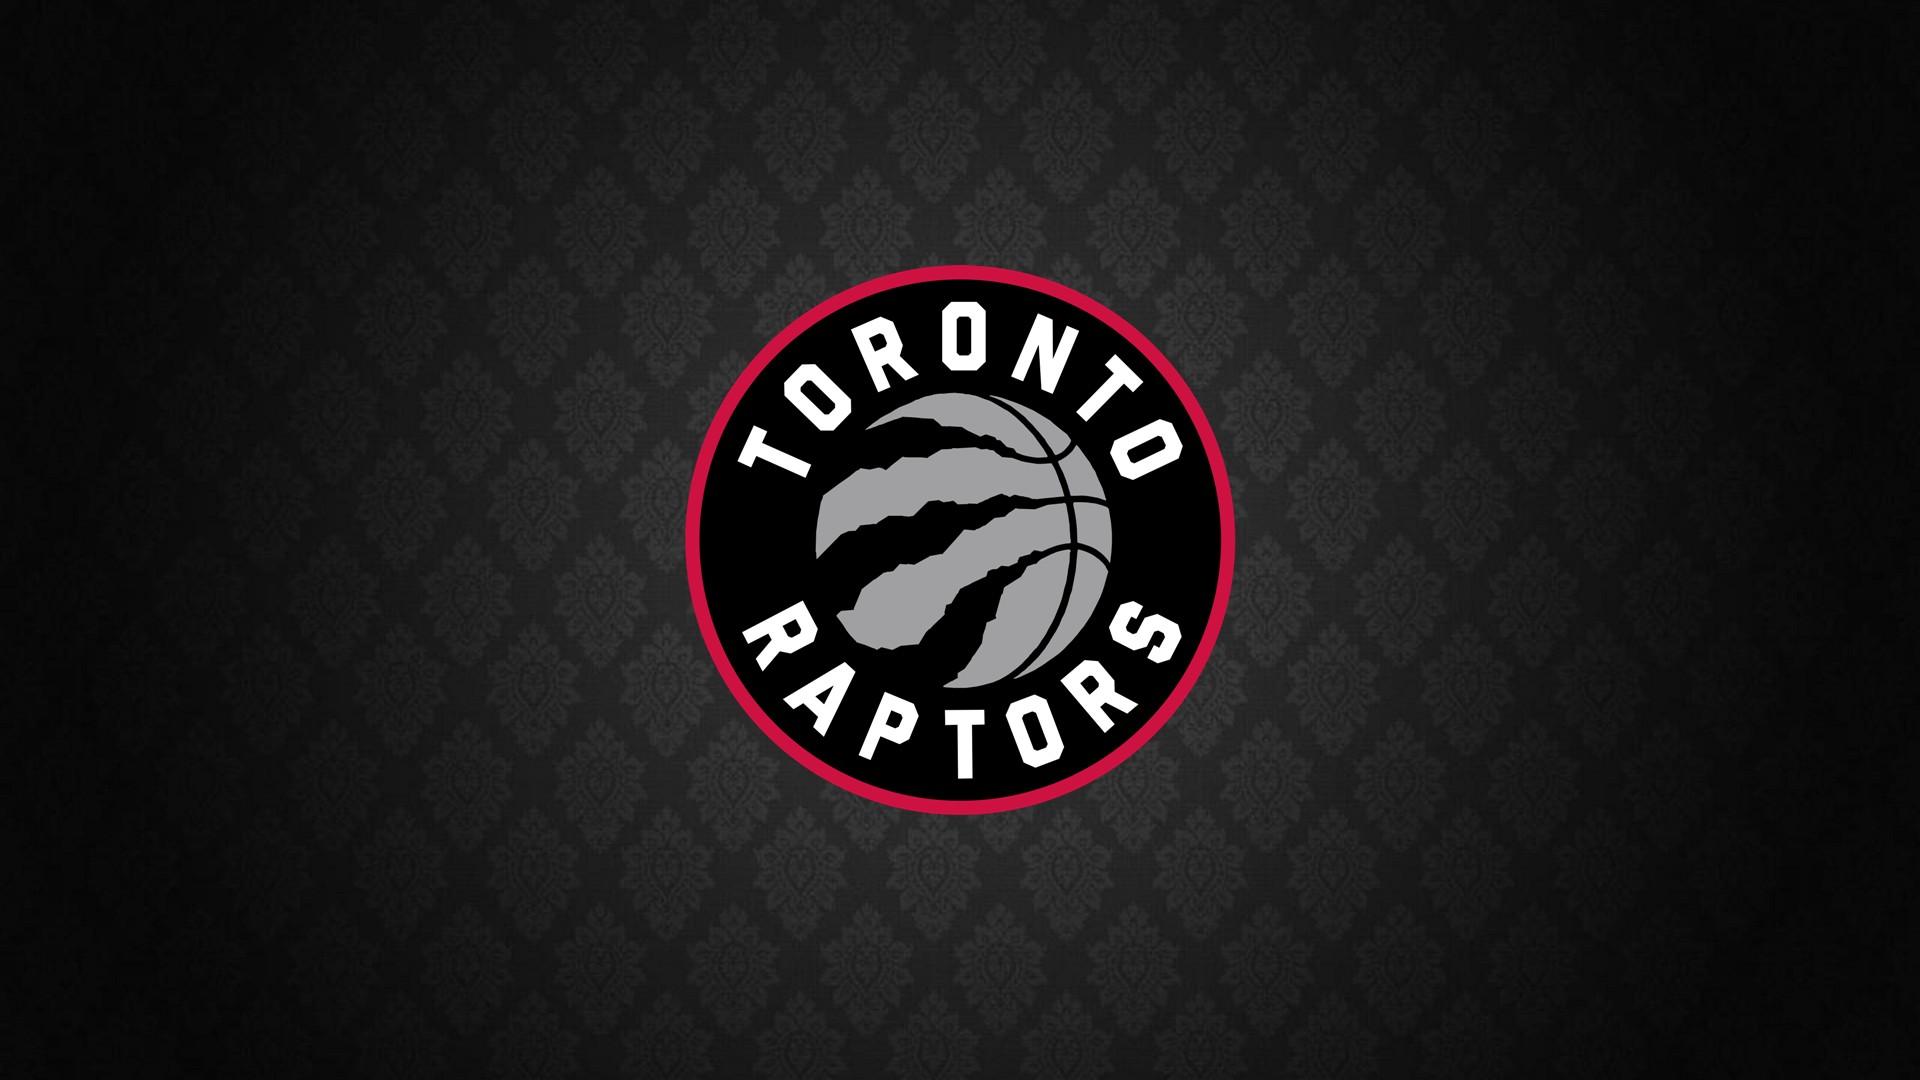 NBA Raptors Desktop Wallpaper 2019 Basketball Wallpaper 1920x1080